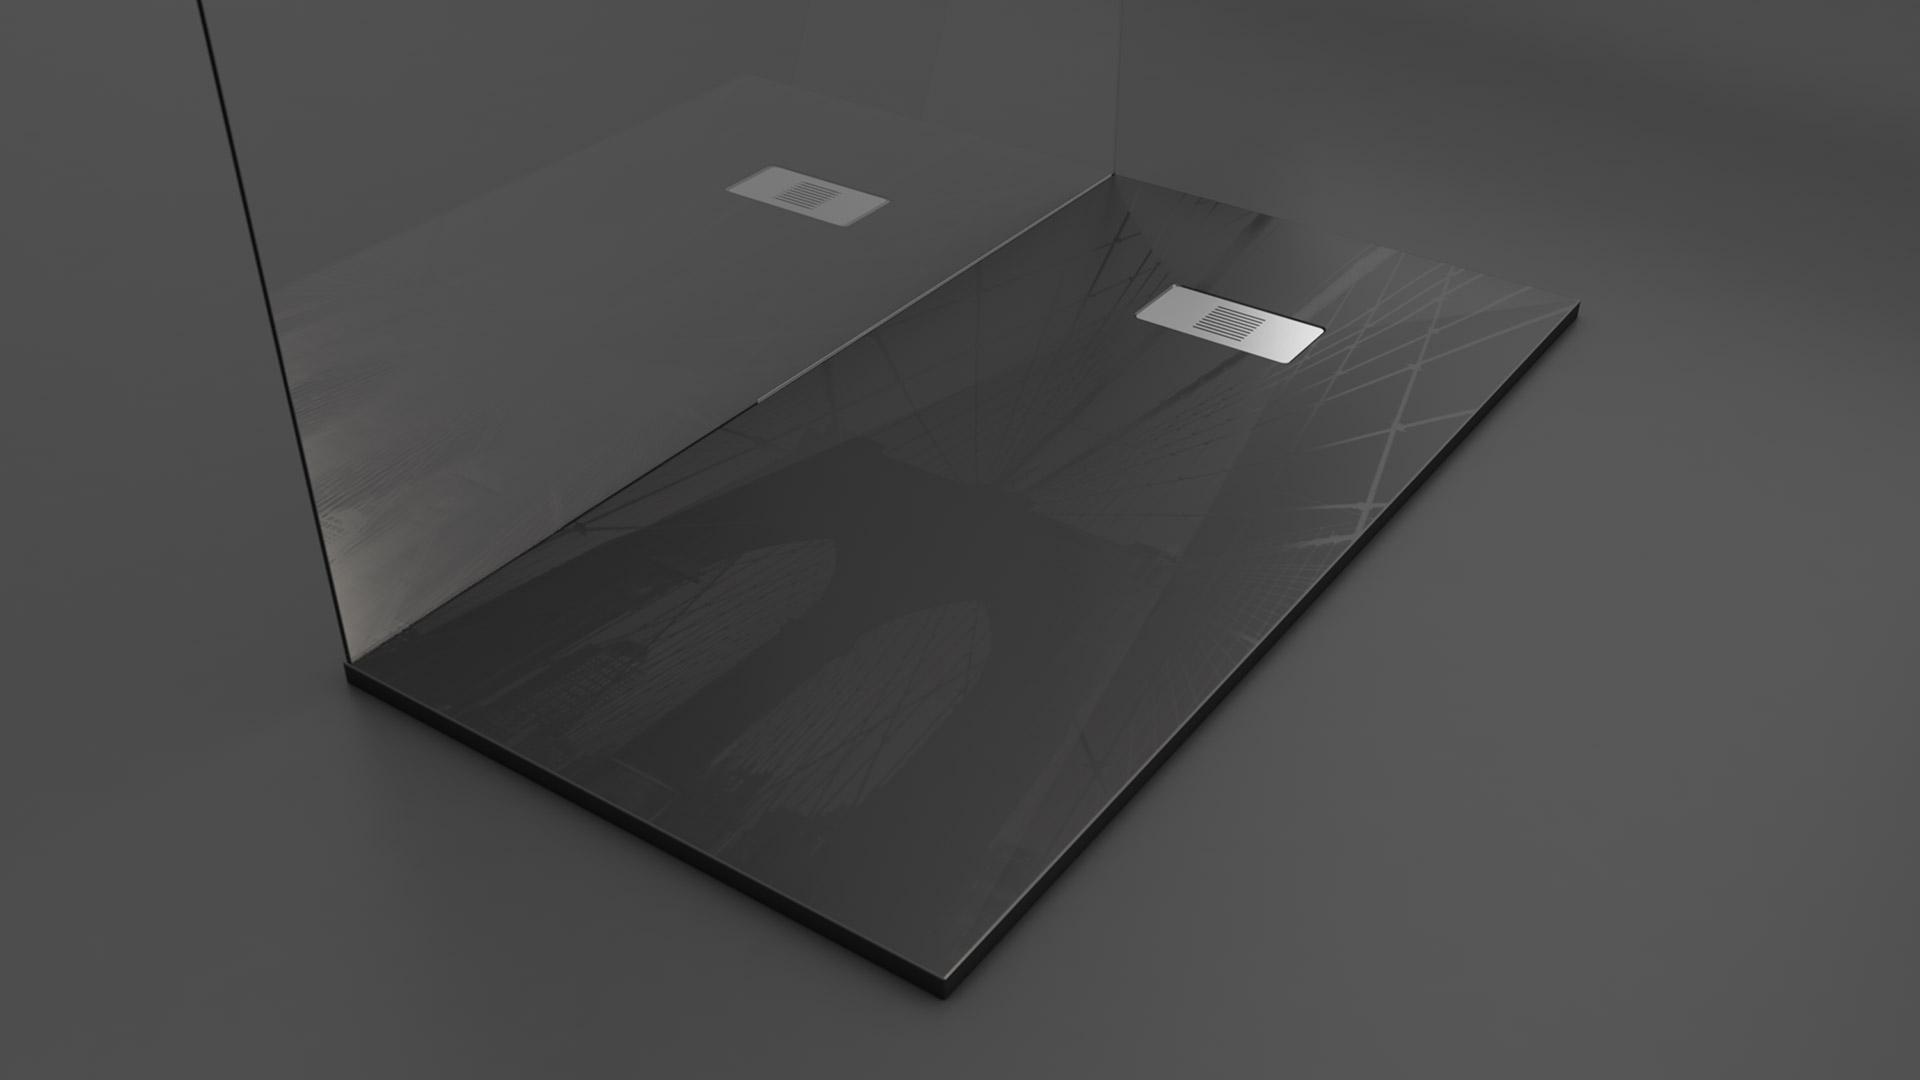 Texence Double Square - Plato de ducha texturizado